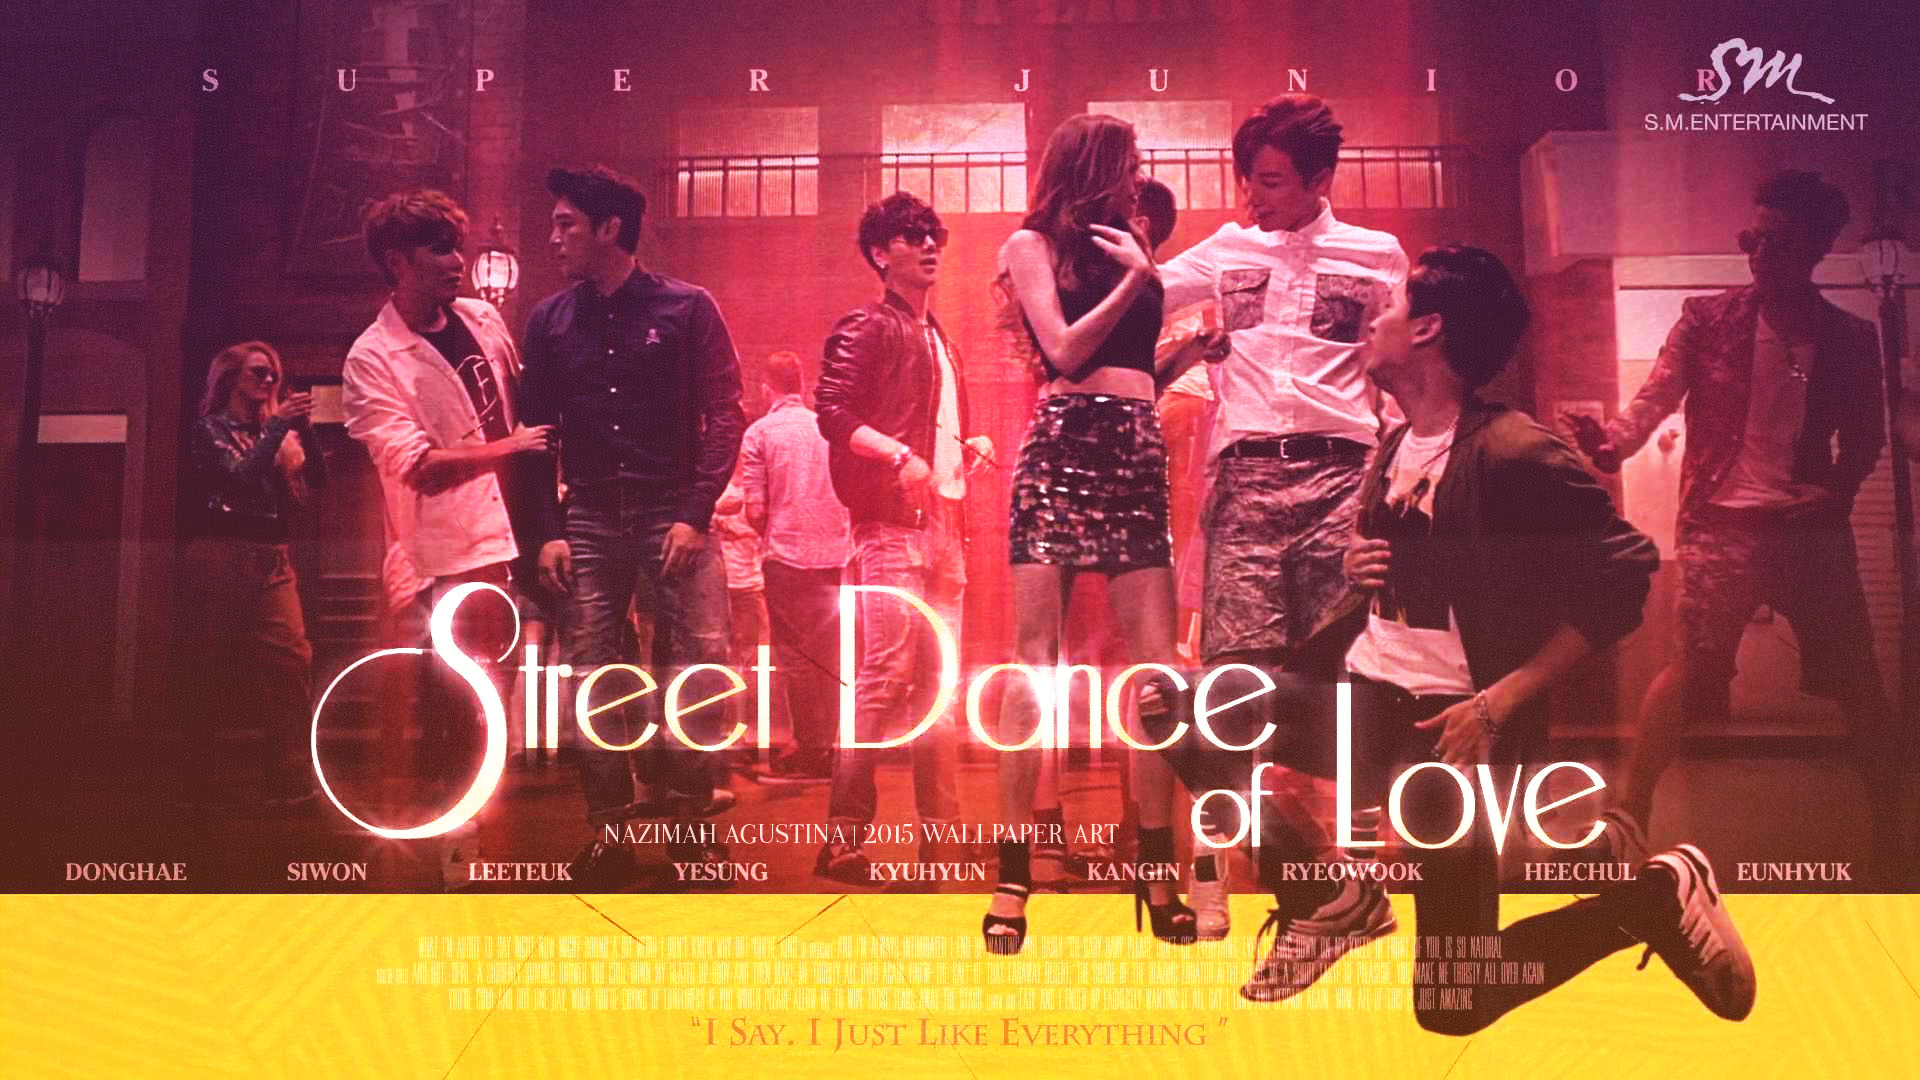 Google themes super junior -  Super Junior Devil Music Video Wallpaper By Nazimah Agustina Art 201